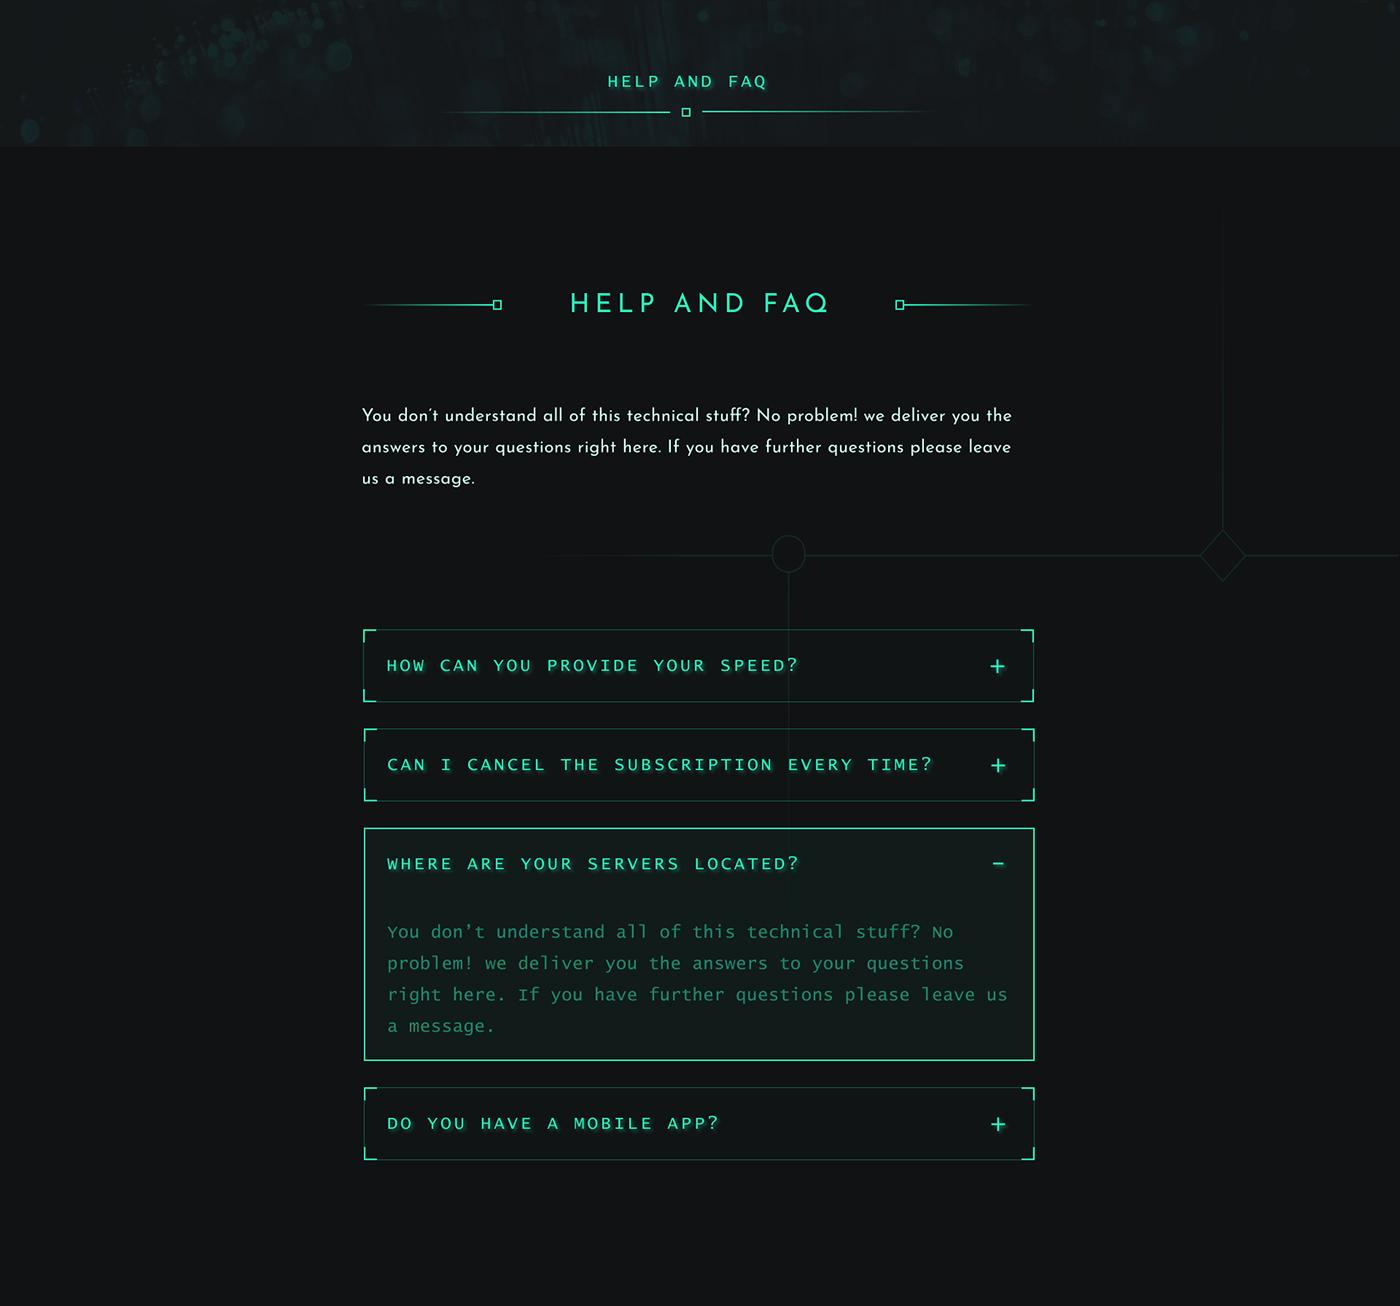 cyber dark digital futuristic hacker System Shock ui design UI/UX Web Web Design